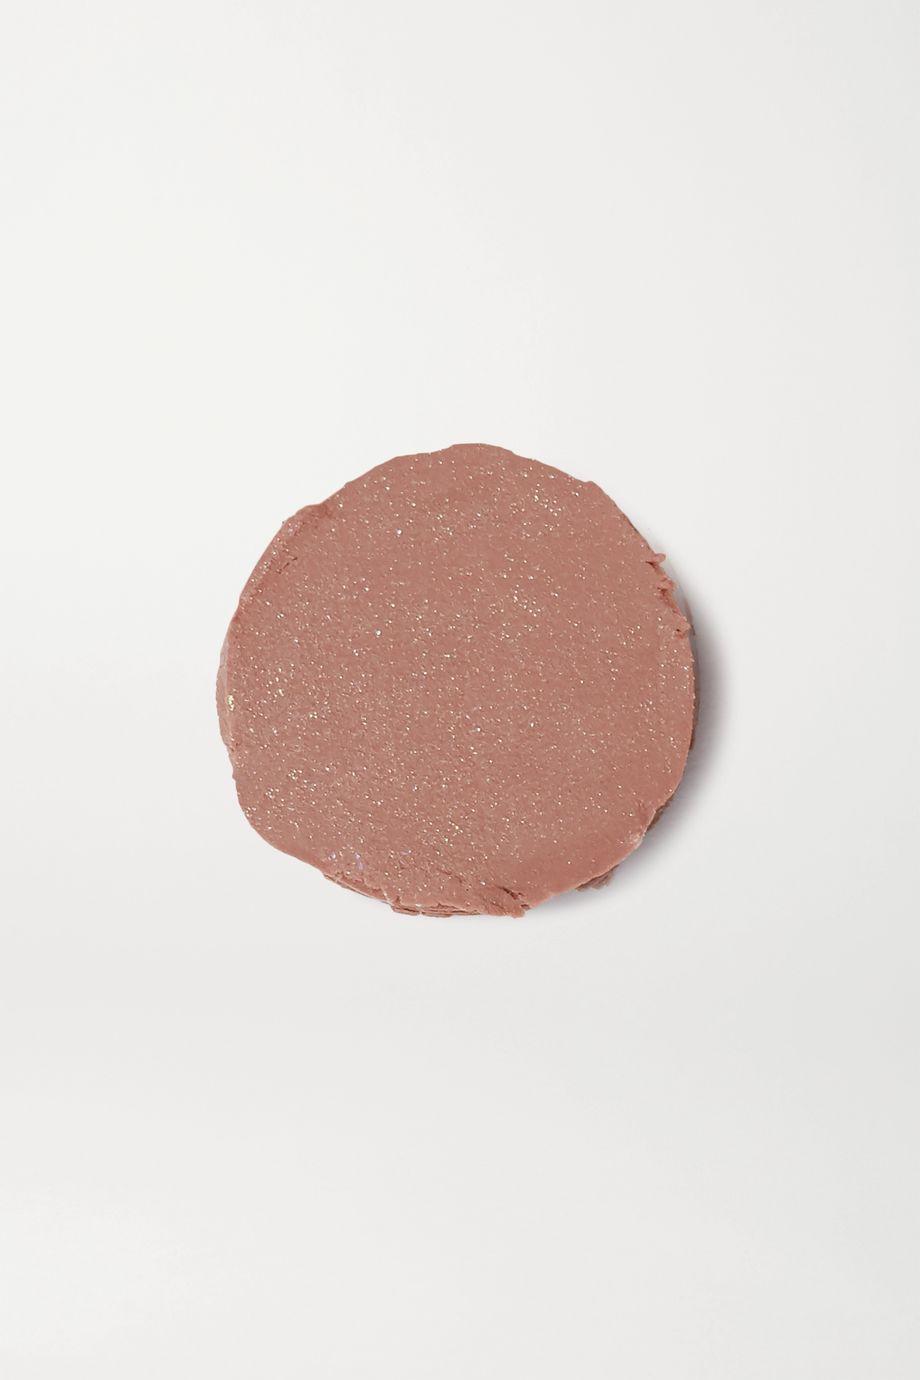 Serge Lutens Lipstick – Compliment Beige 28 – Lippenstift